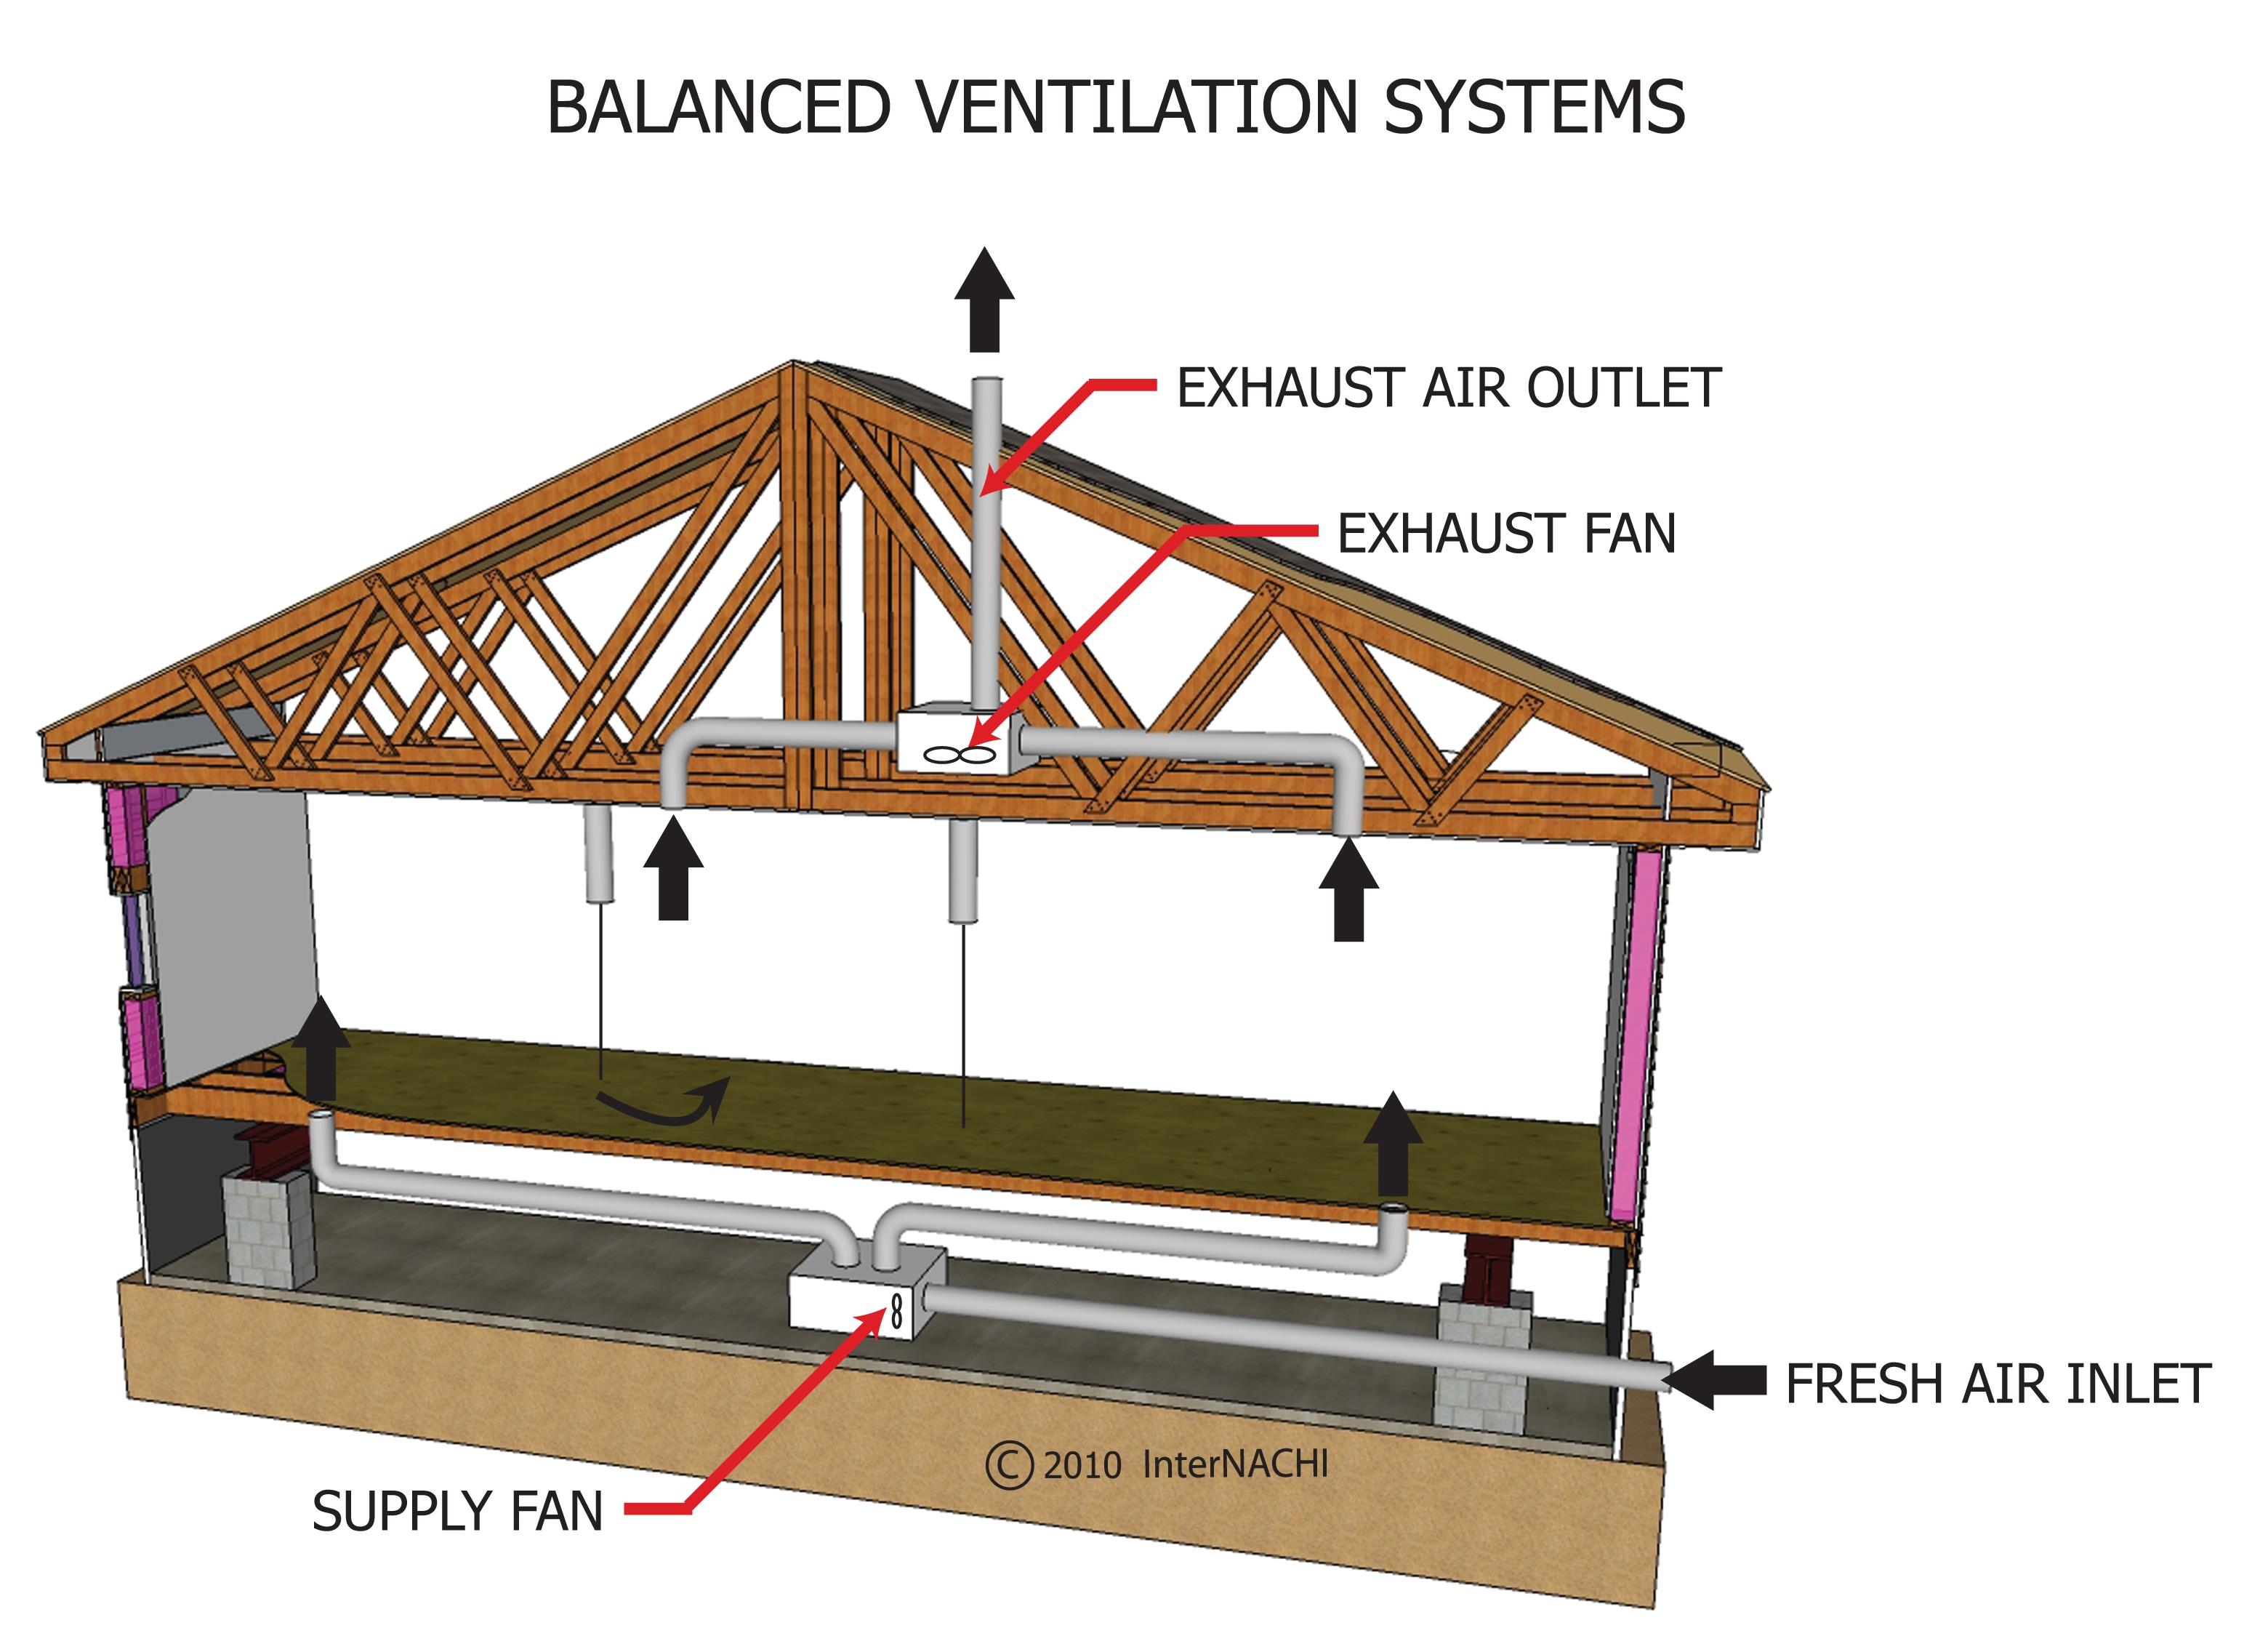 Balanced ventilation system.